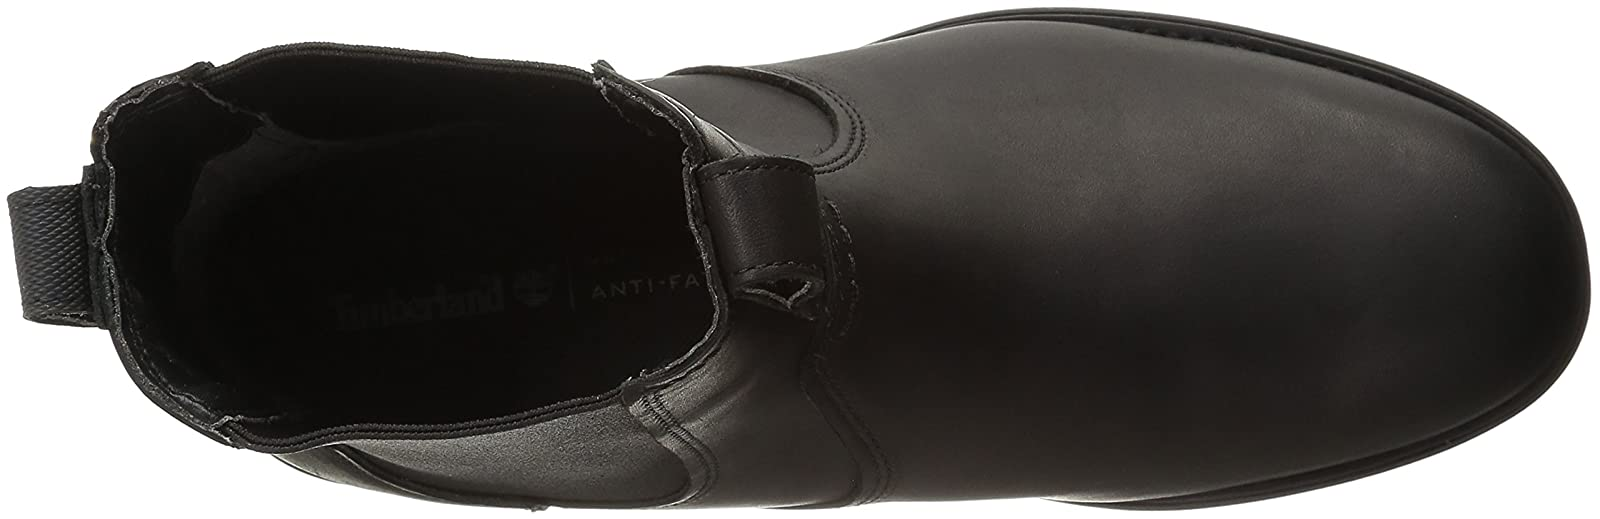 Timberland Men's Carter Notch PT Chelsea Boot 8 M US - 8